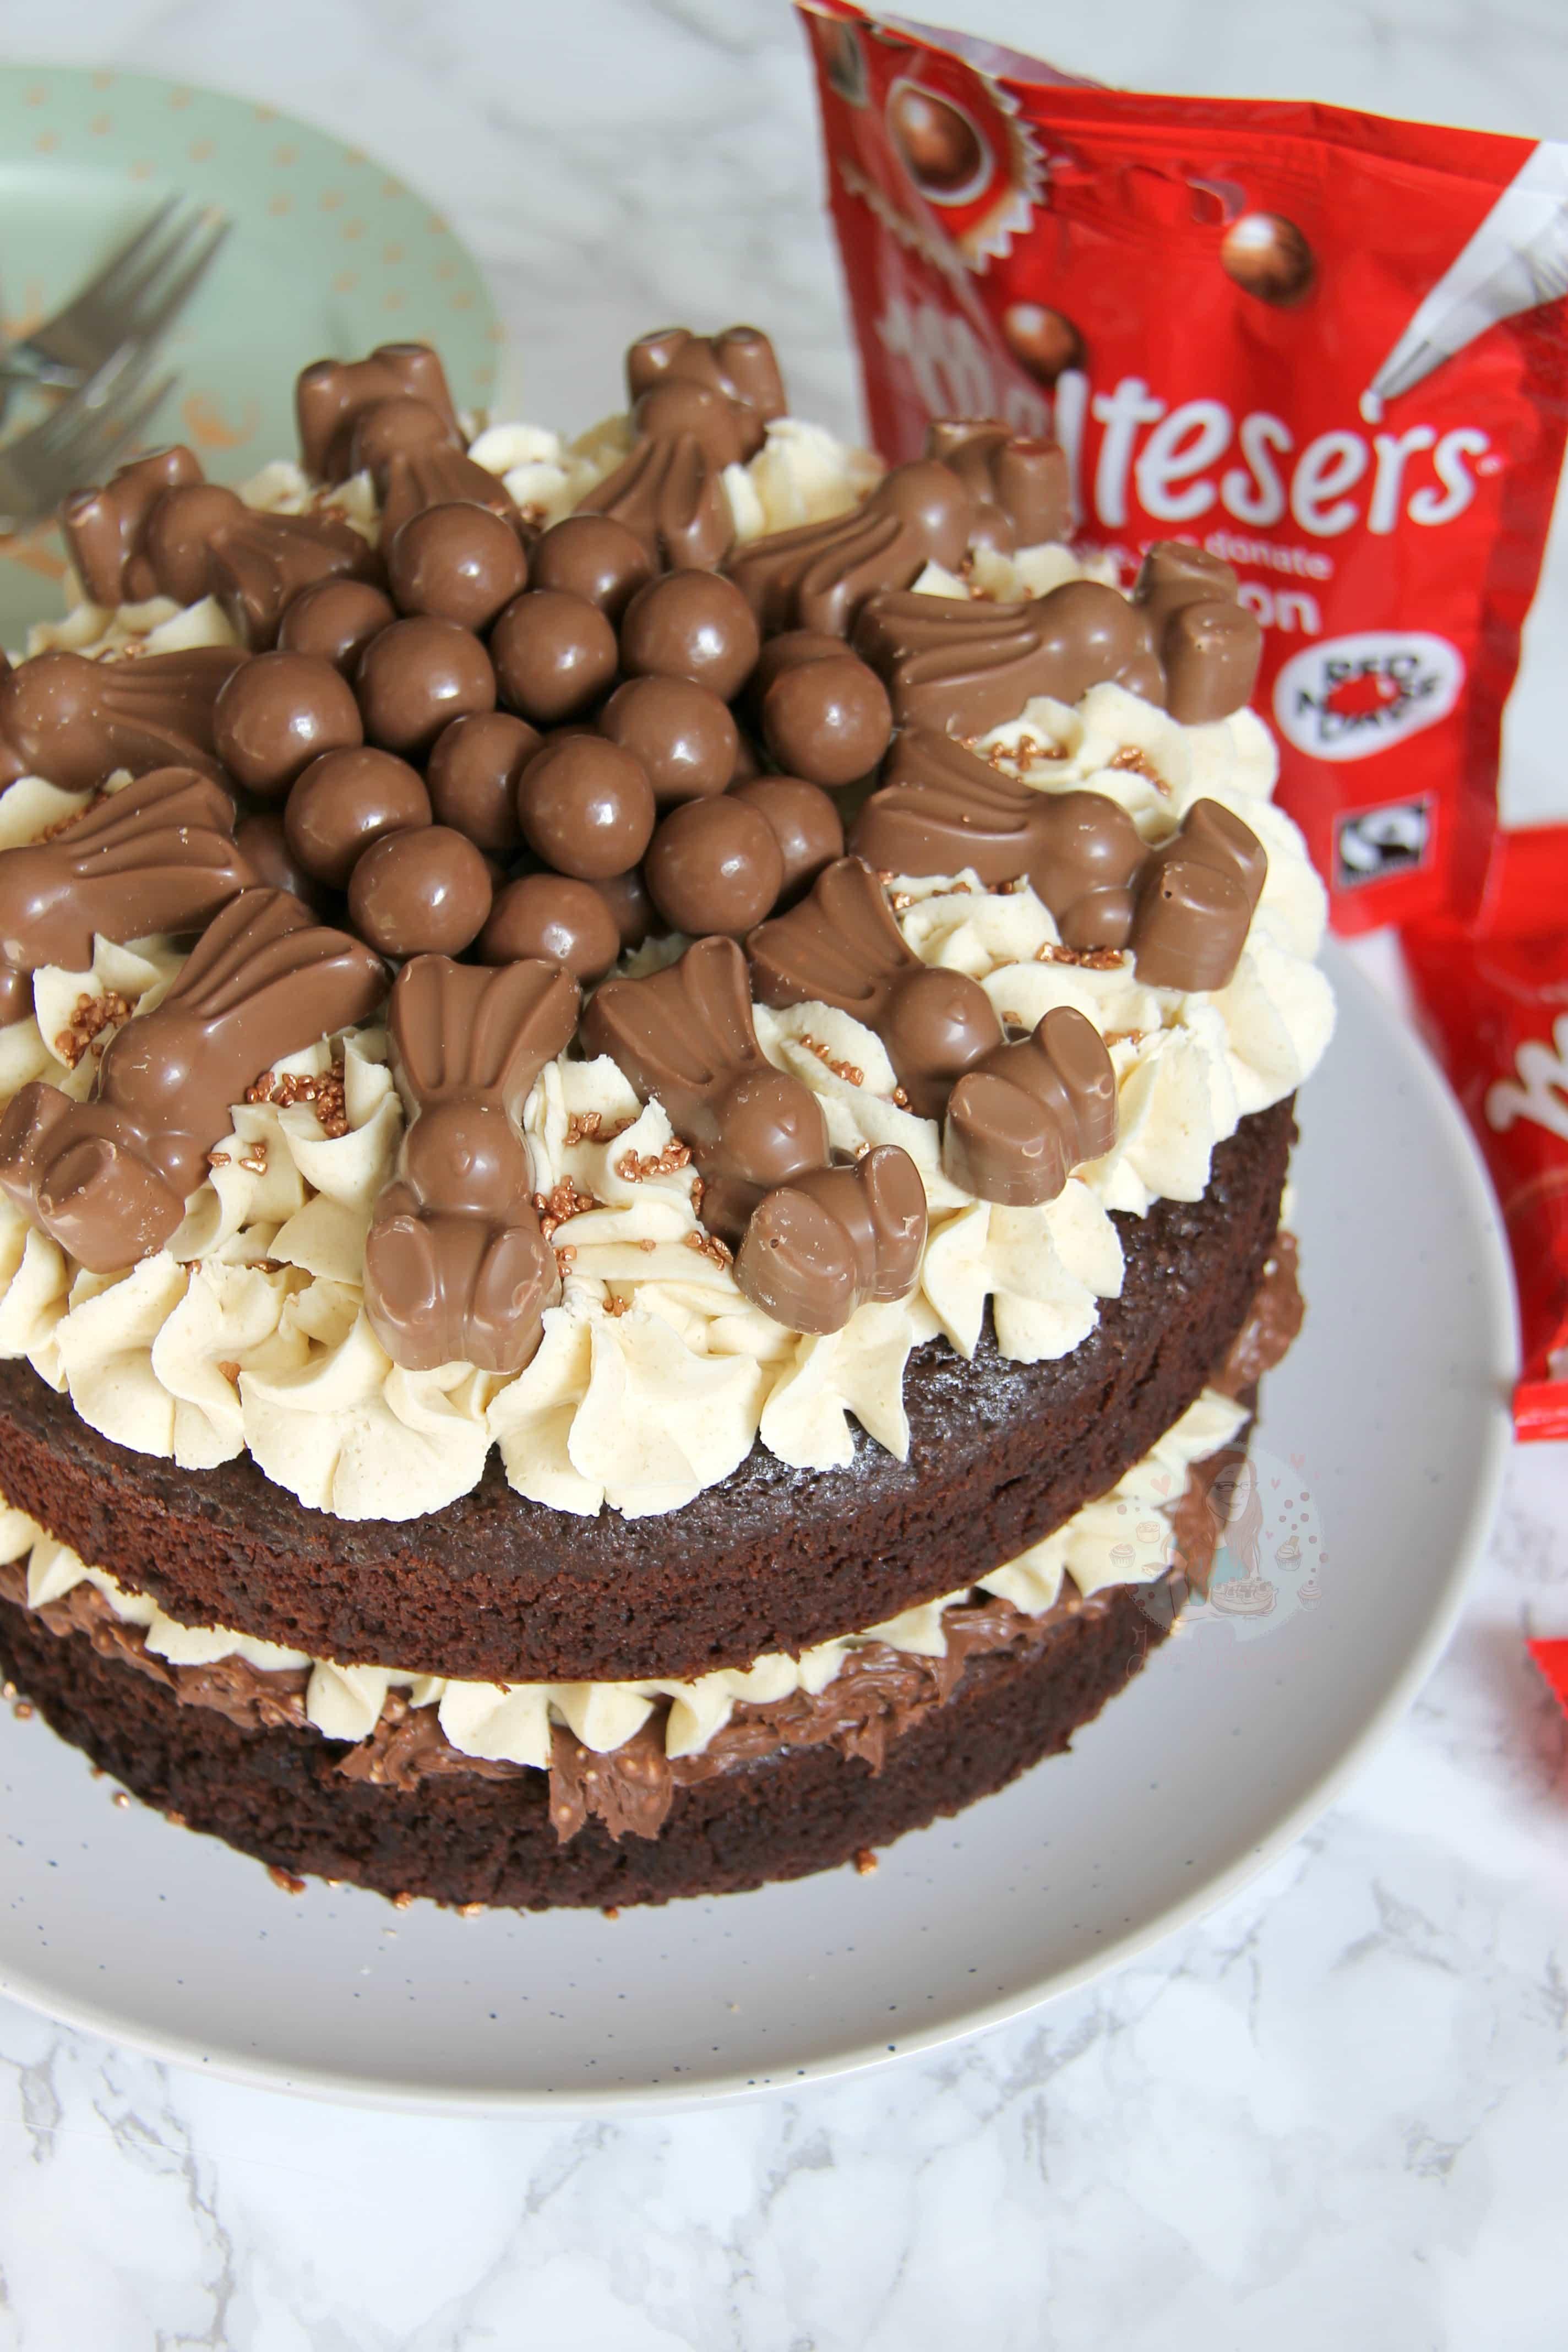 Chocolate Buttercream Recipe For Crumb Coat